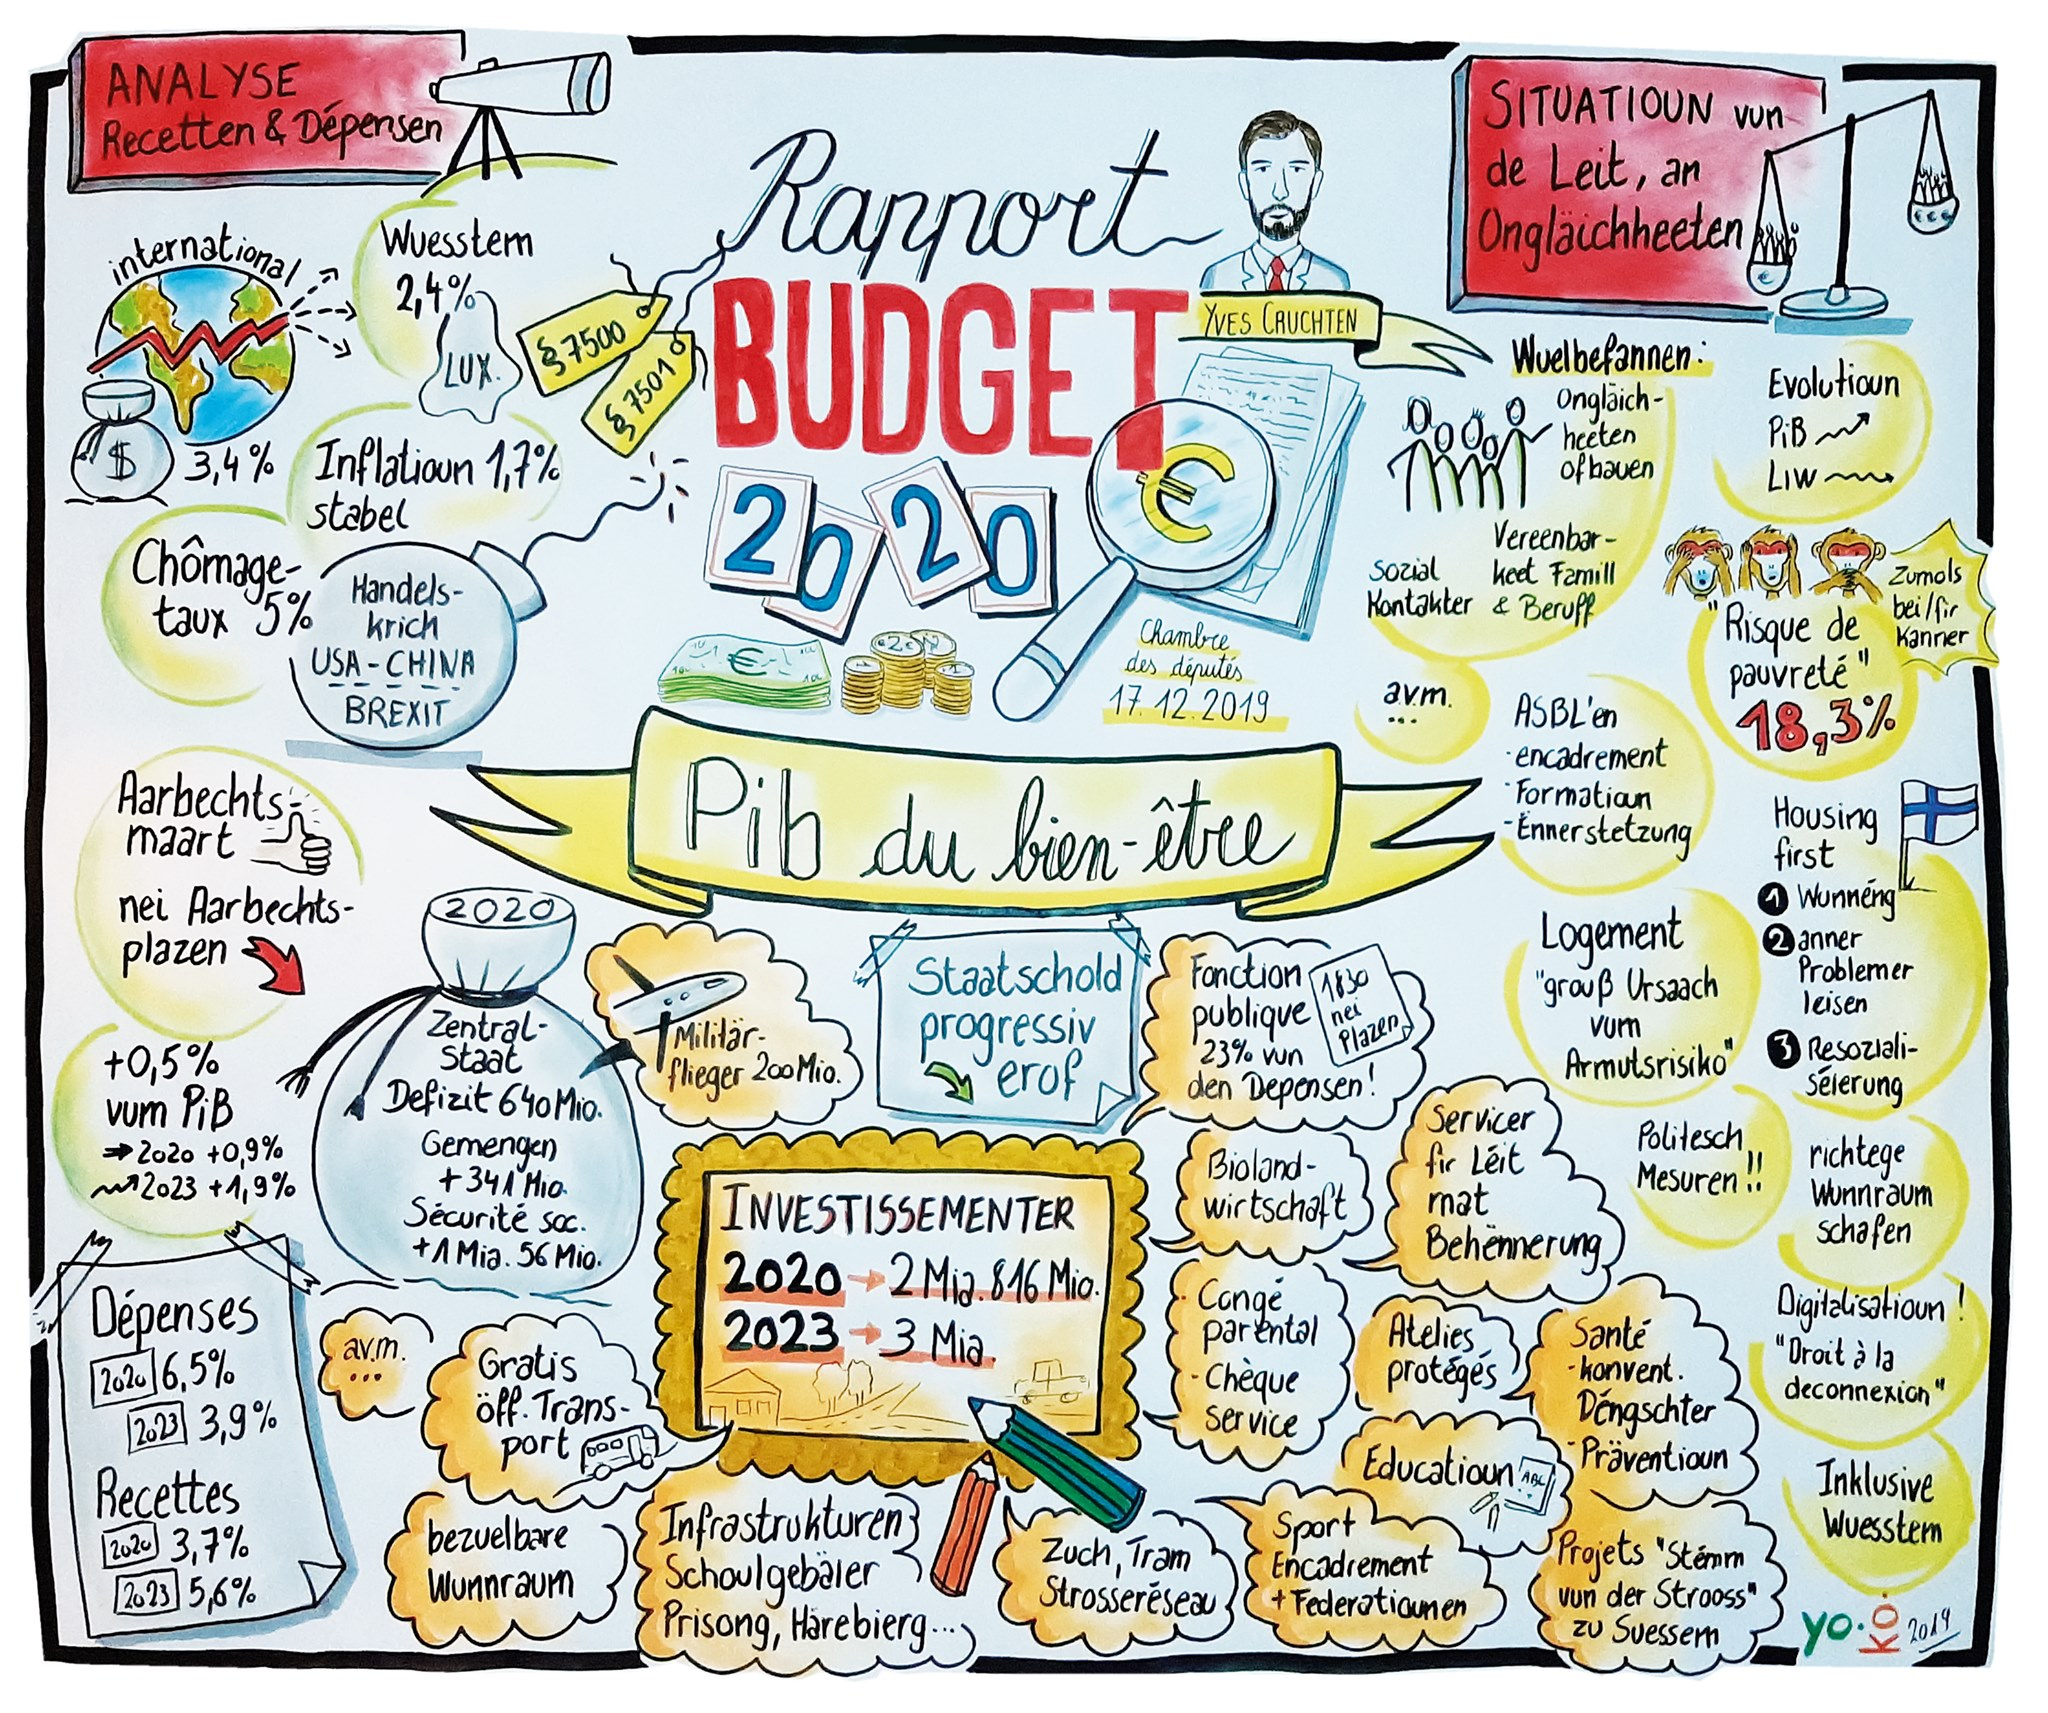 Graphics Rcording Budgetsrapport '20